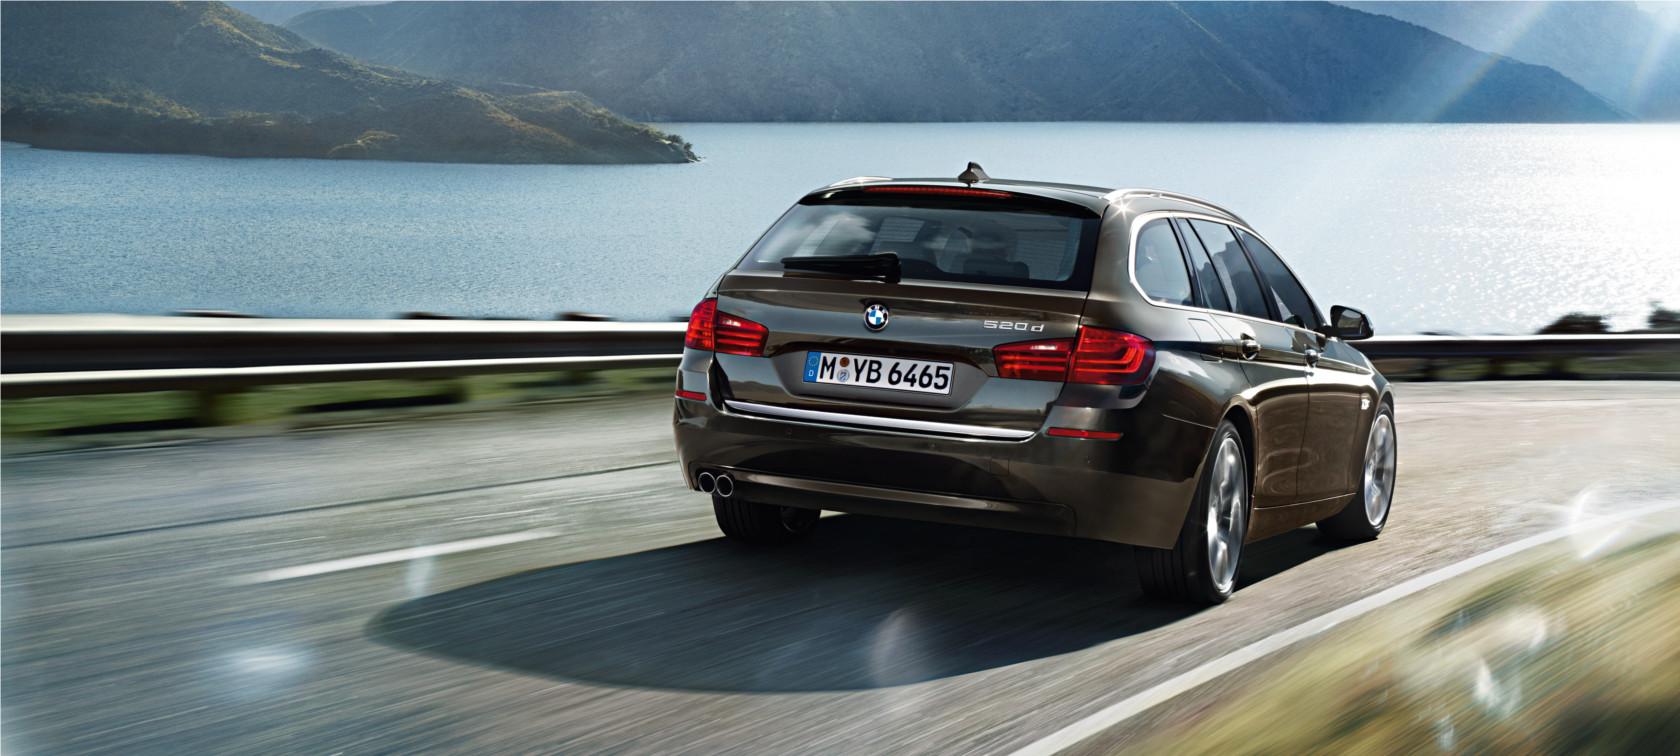 BMW 5 Series: Vehicle equipment